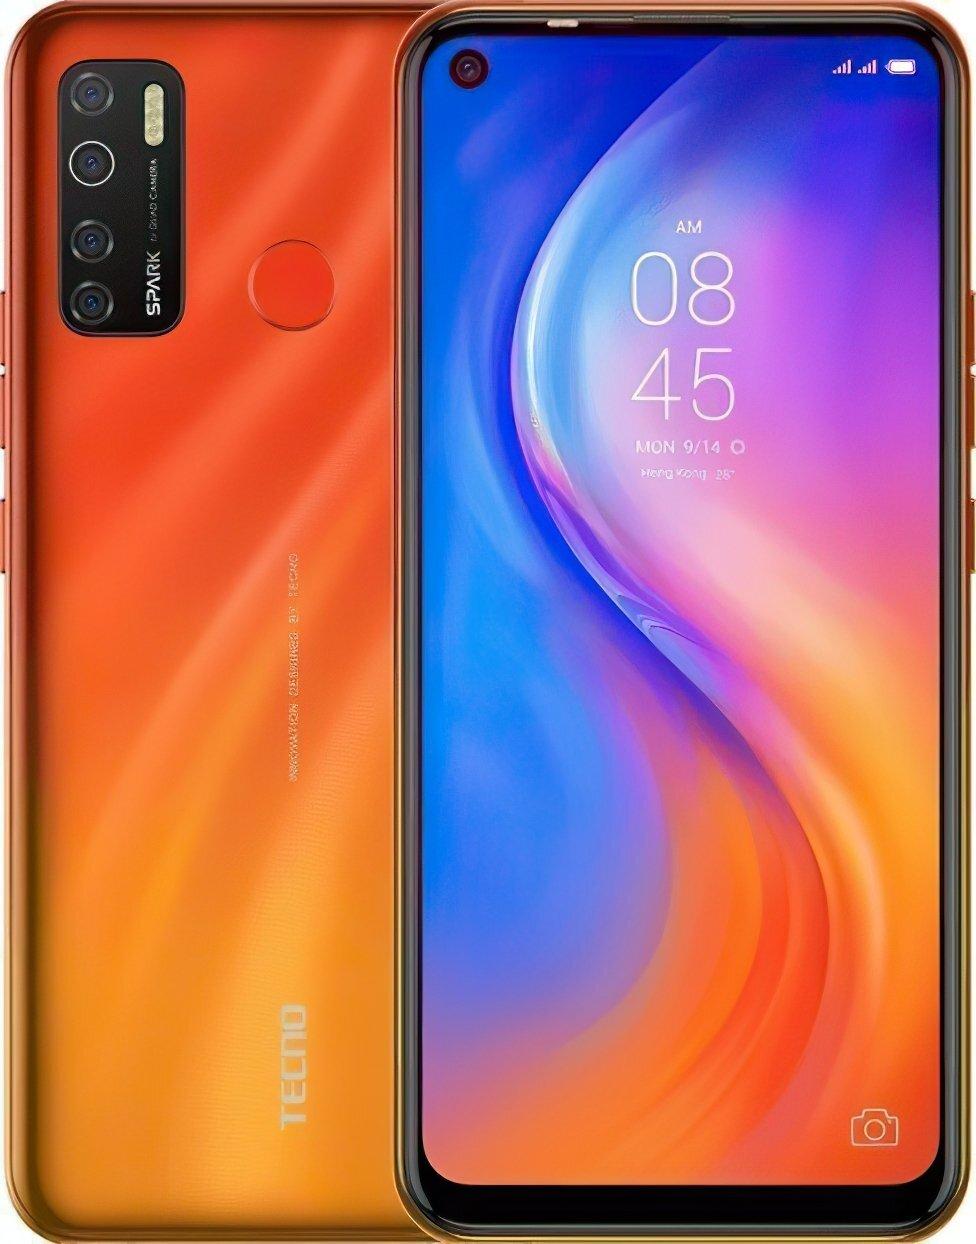 Смартфон TECNO Spark 5 Pro (KD7) 4/64Gb DS Spark Orange фото 1